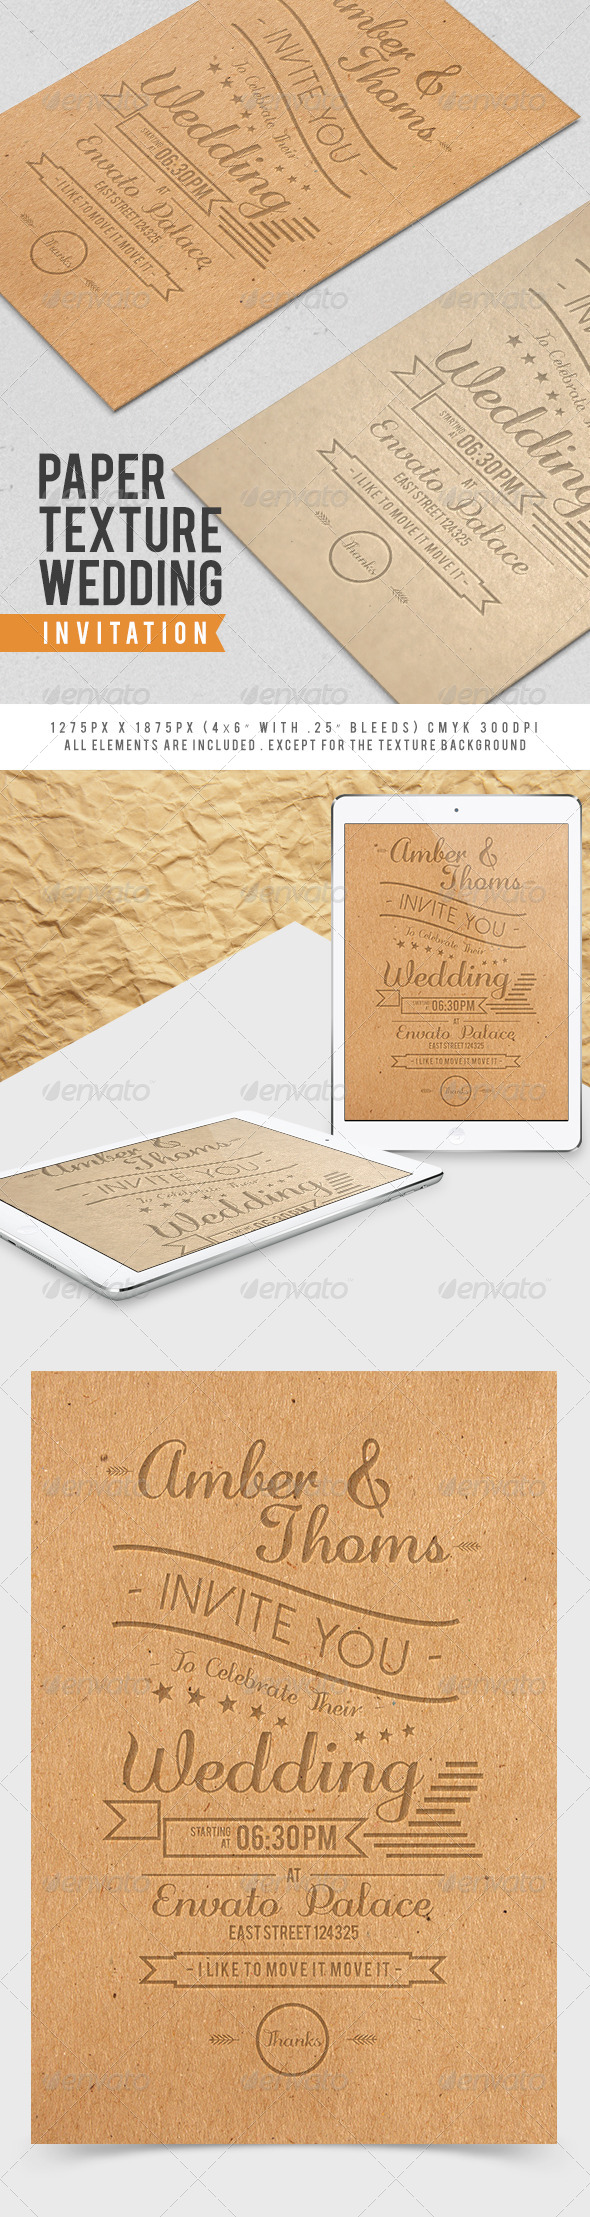 Paper Texture Wedding Invitation - Weddings Cards & Invites